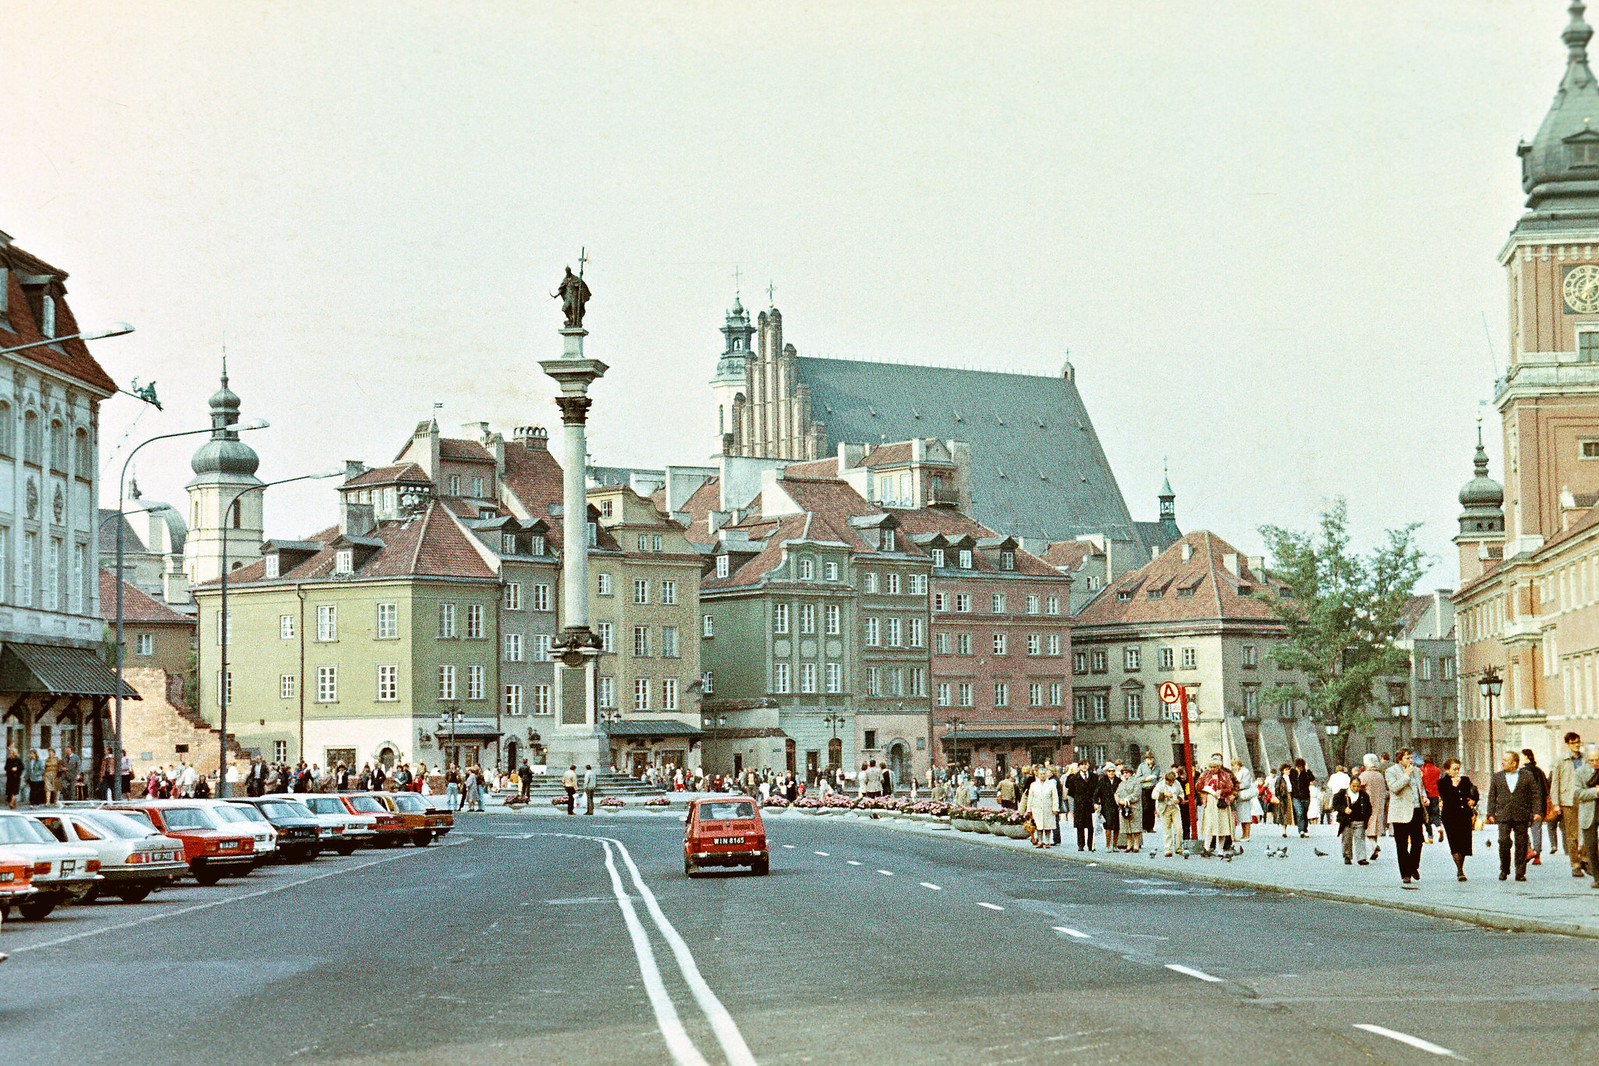 1985 год. Варшава. Старый город. Замковая площадь.